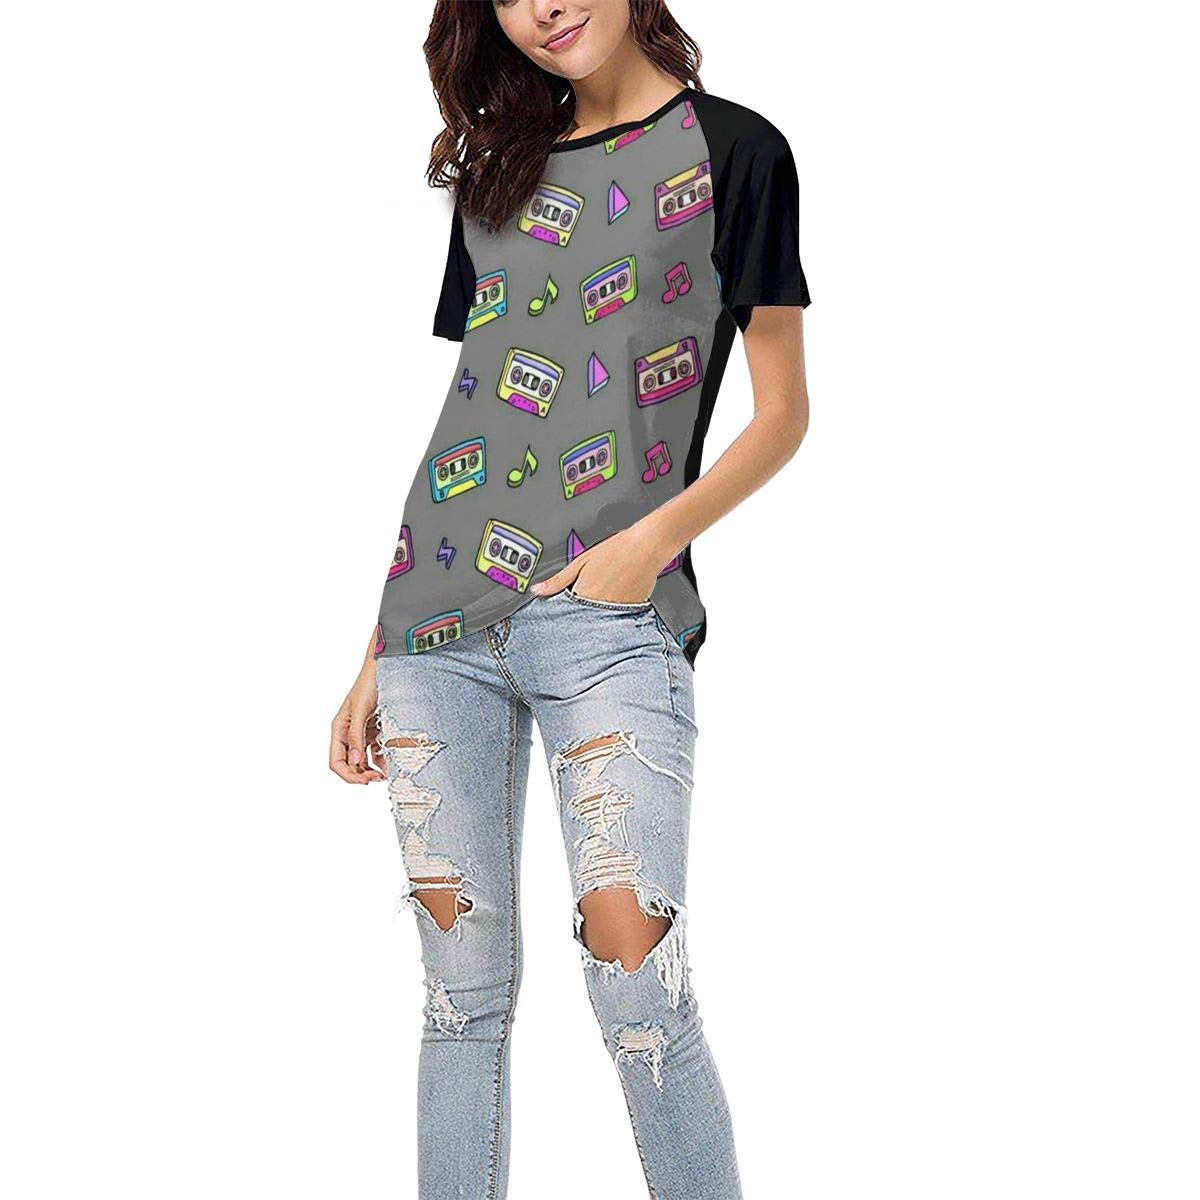 QWXZC Colored Cassette Womens Short Sleeves Baseball Tee Casual Raglan Shirt Baseball Raglan T-Shirt.Black.